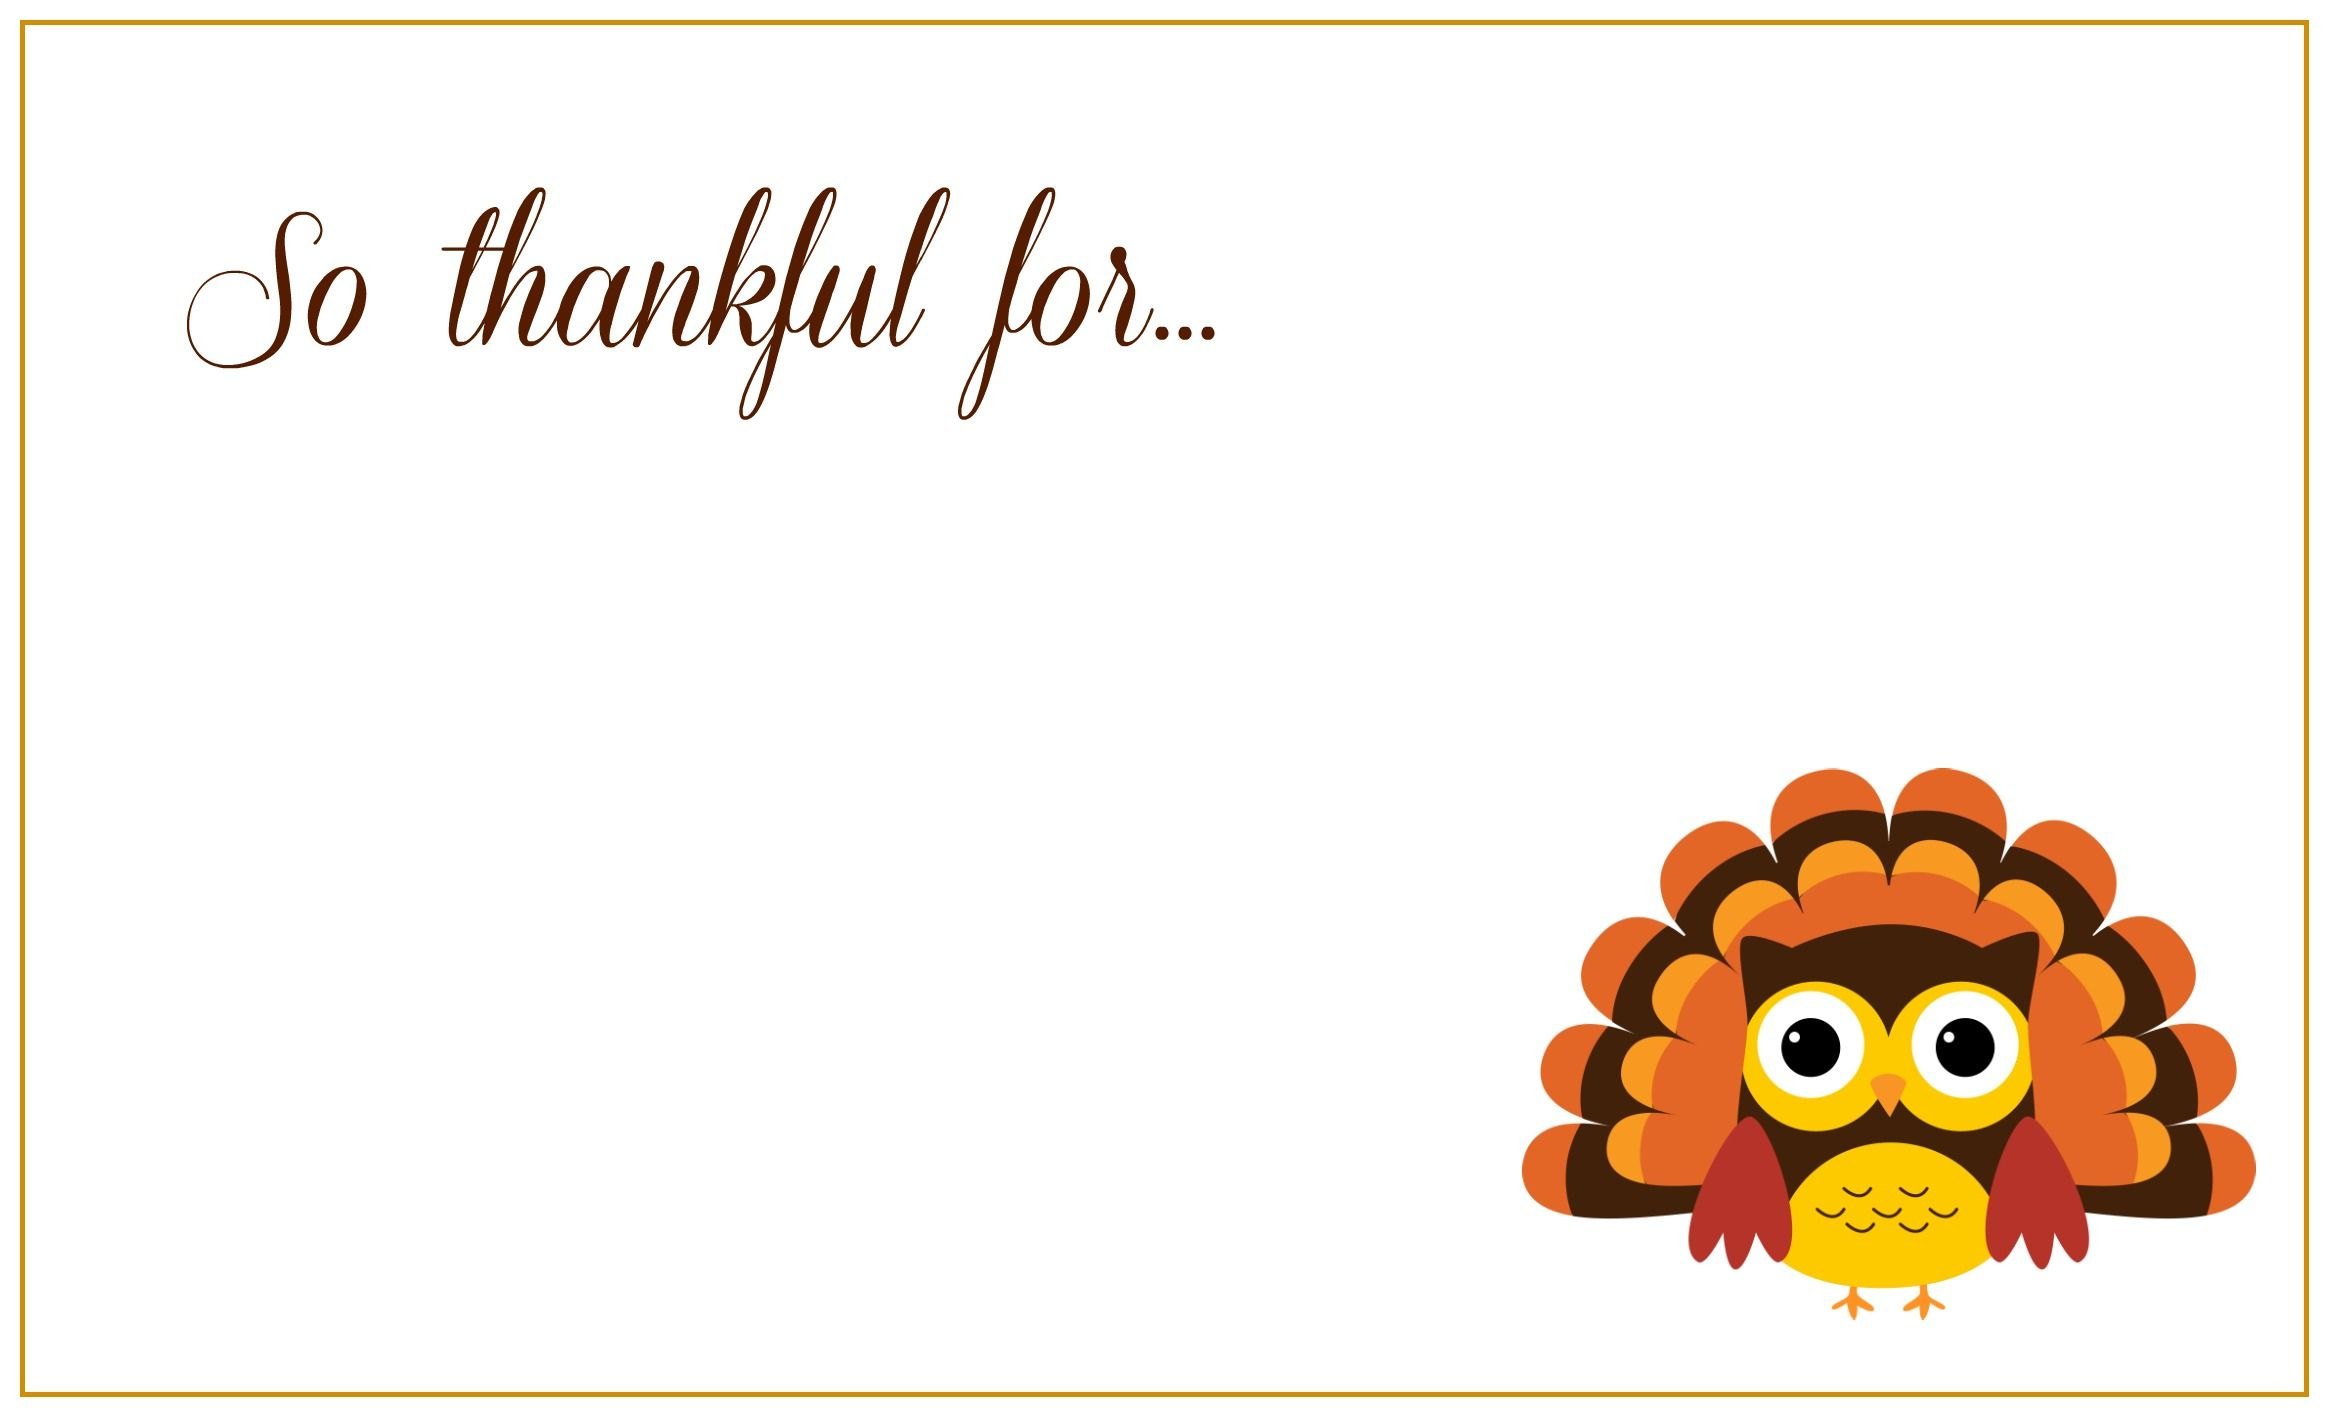 Free Printable Thanksgiving Greeting Cards | Thanksgiving Day - Free Printable Thanksgiving Cards